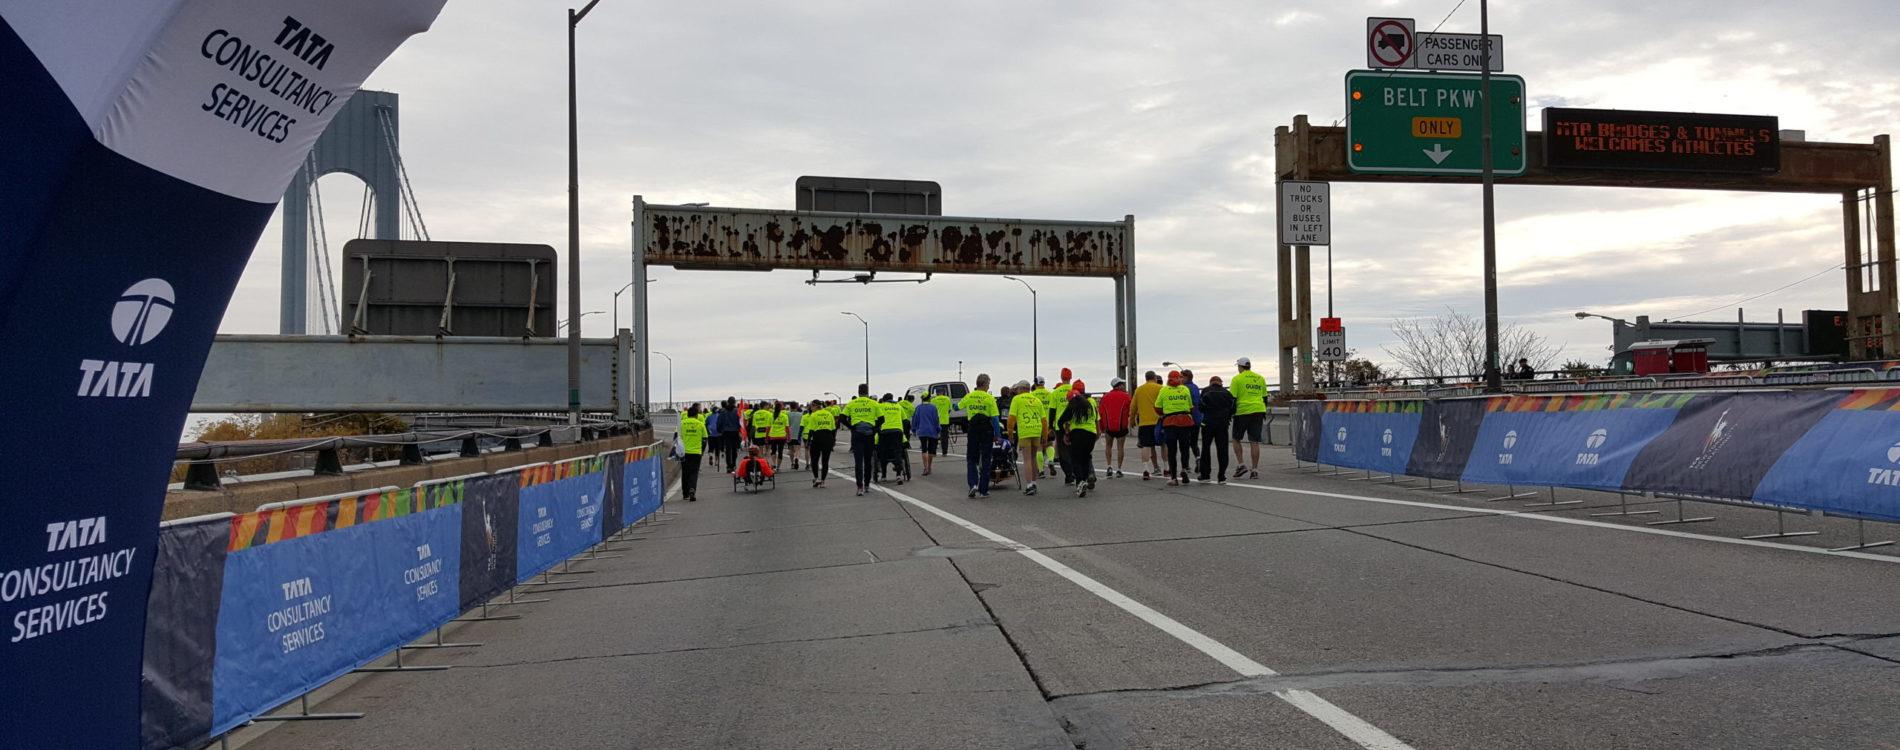 NYC Marathon_2015-11-01 08.53.31